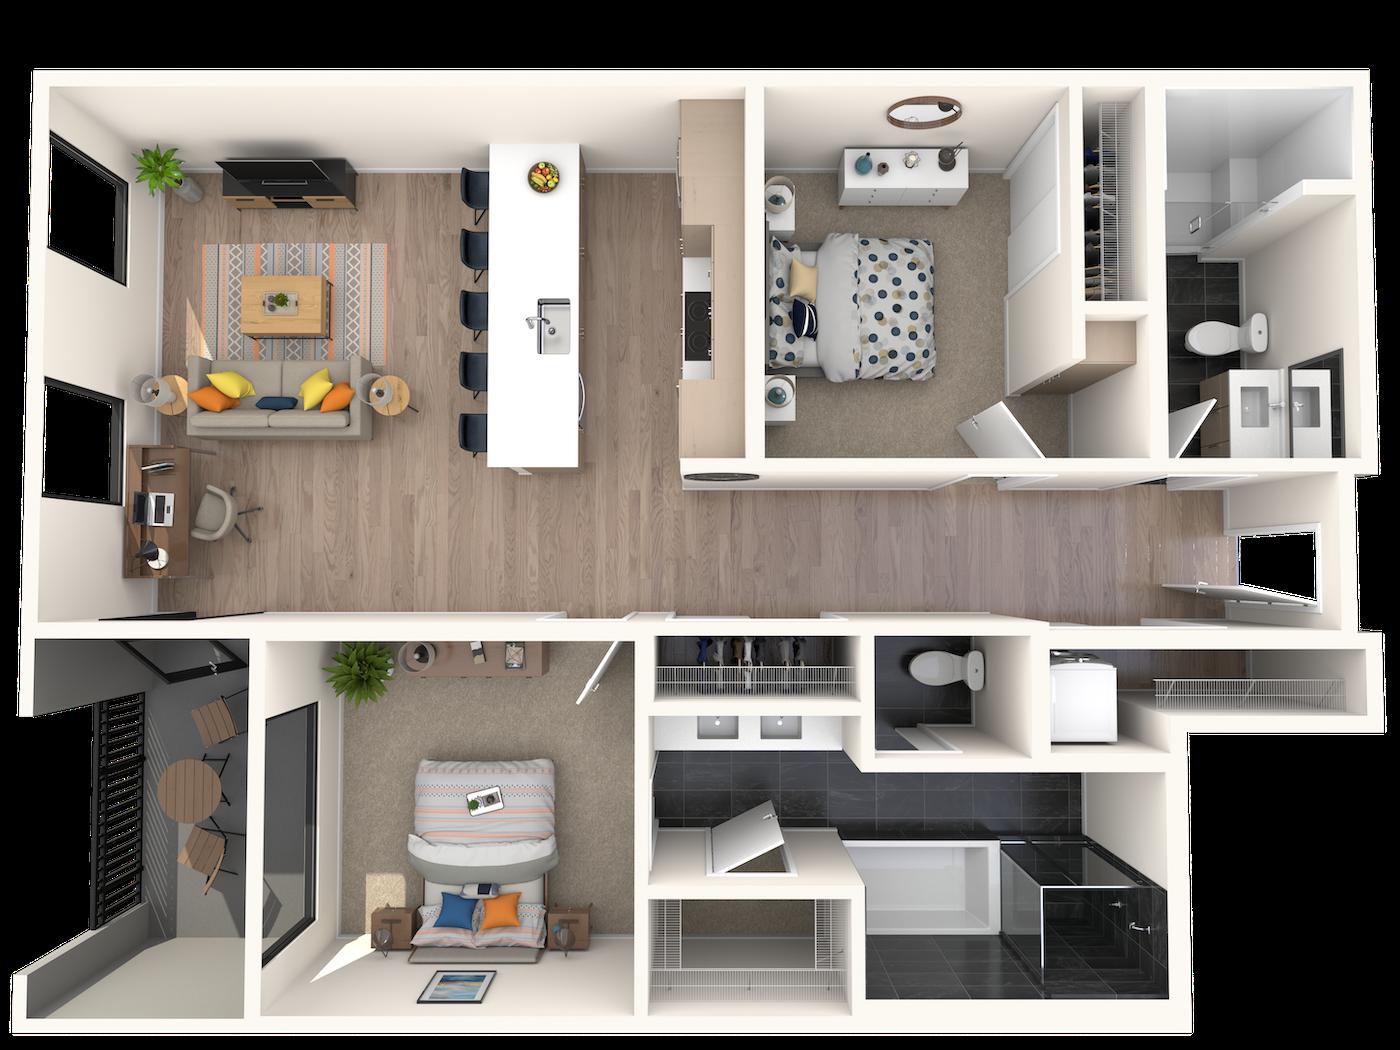 A2.2 Floor Plan